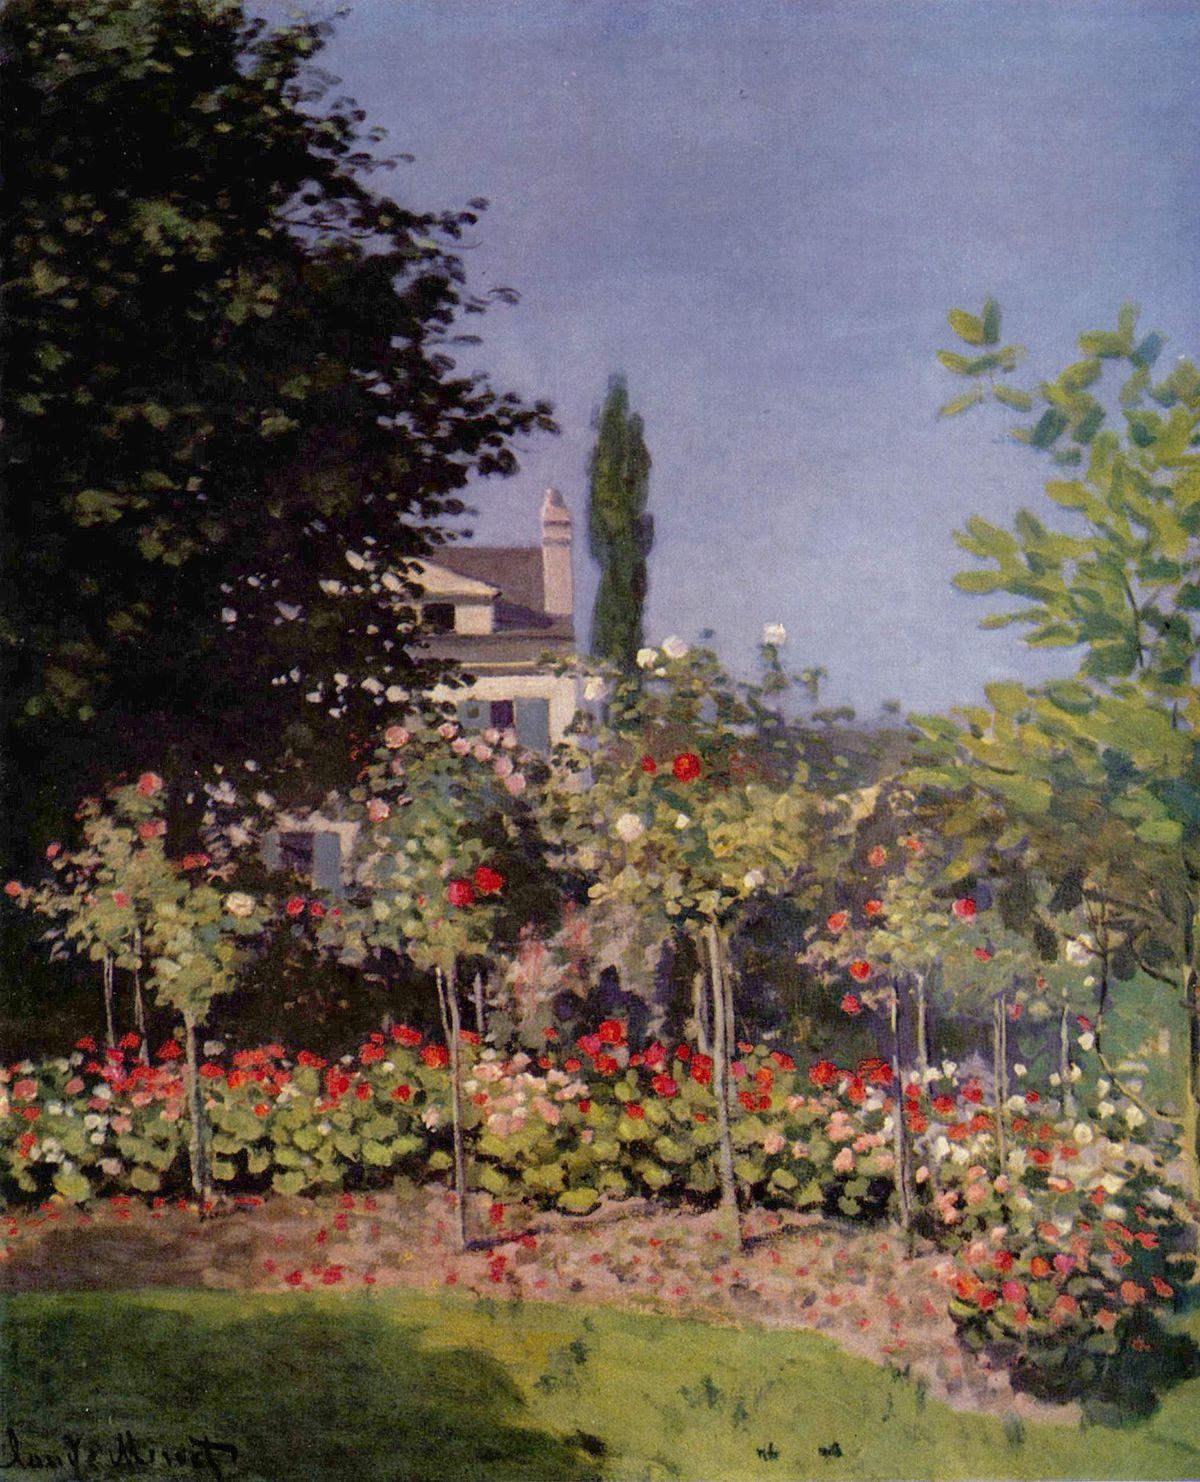 Jardin wiktionnaire for Jardin wiktionnaire